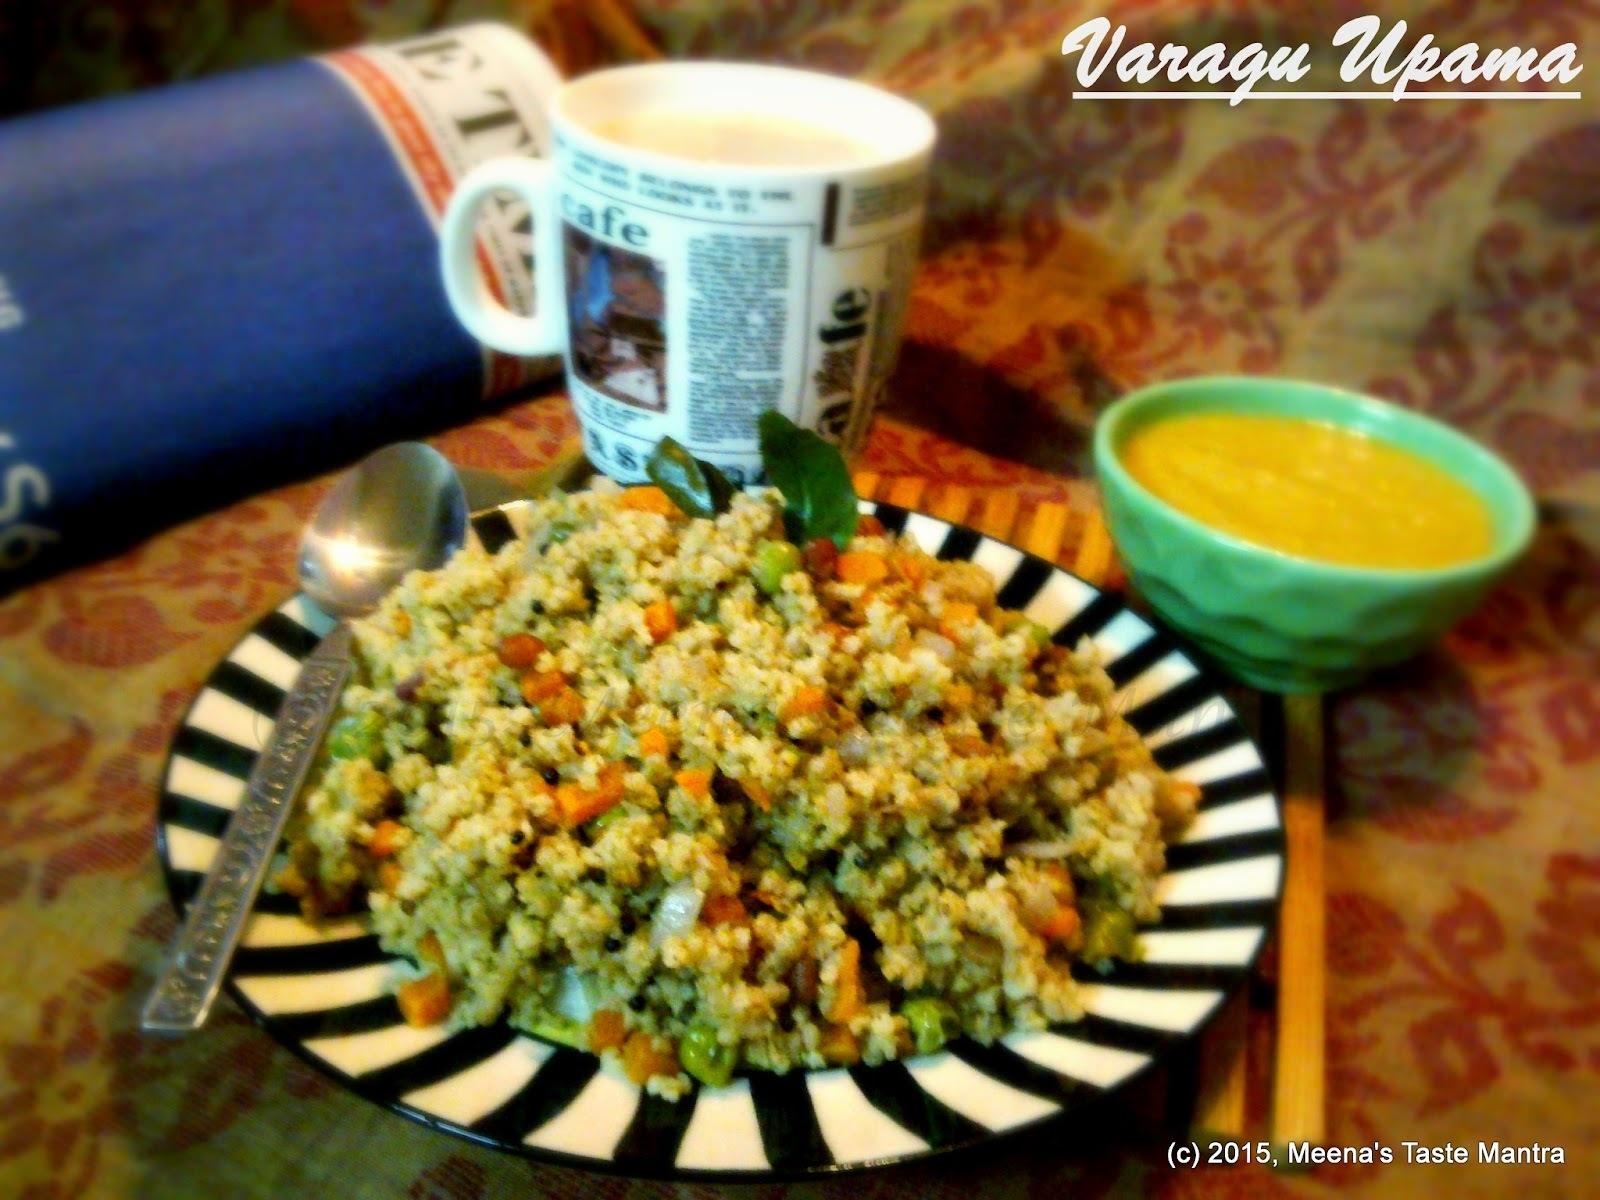 Varagu Upama | Kodo Millet Porridge - A nutritious Breakfast option with Millet